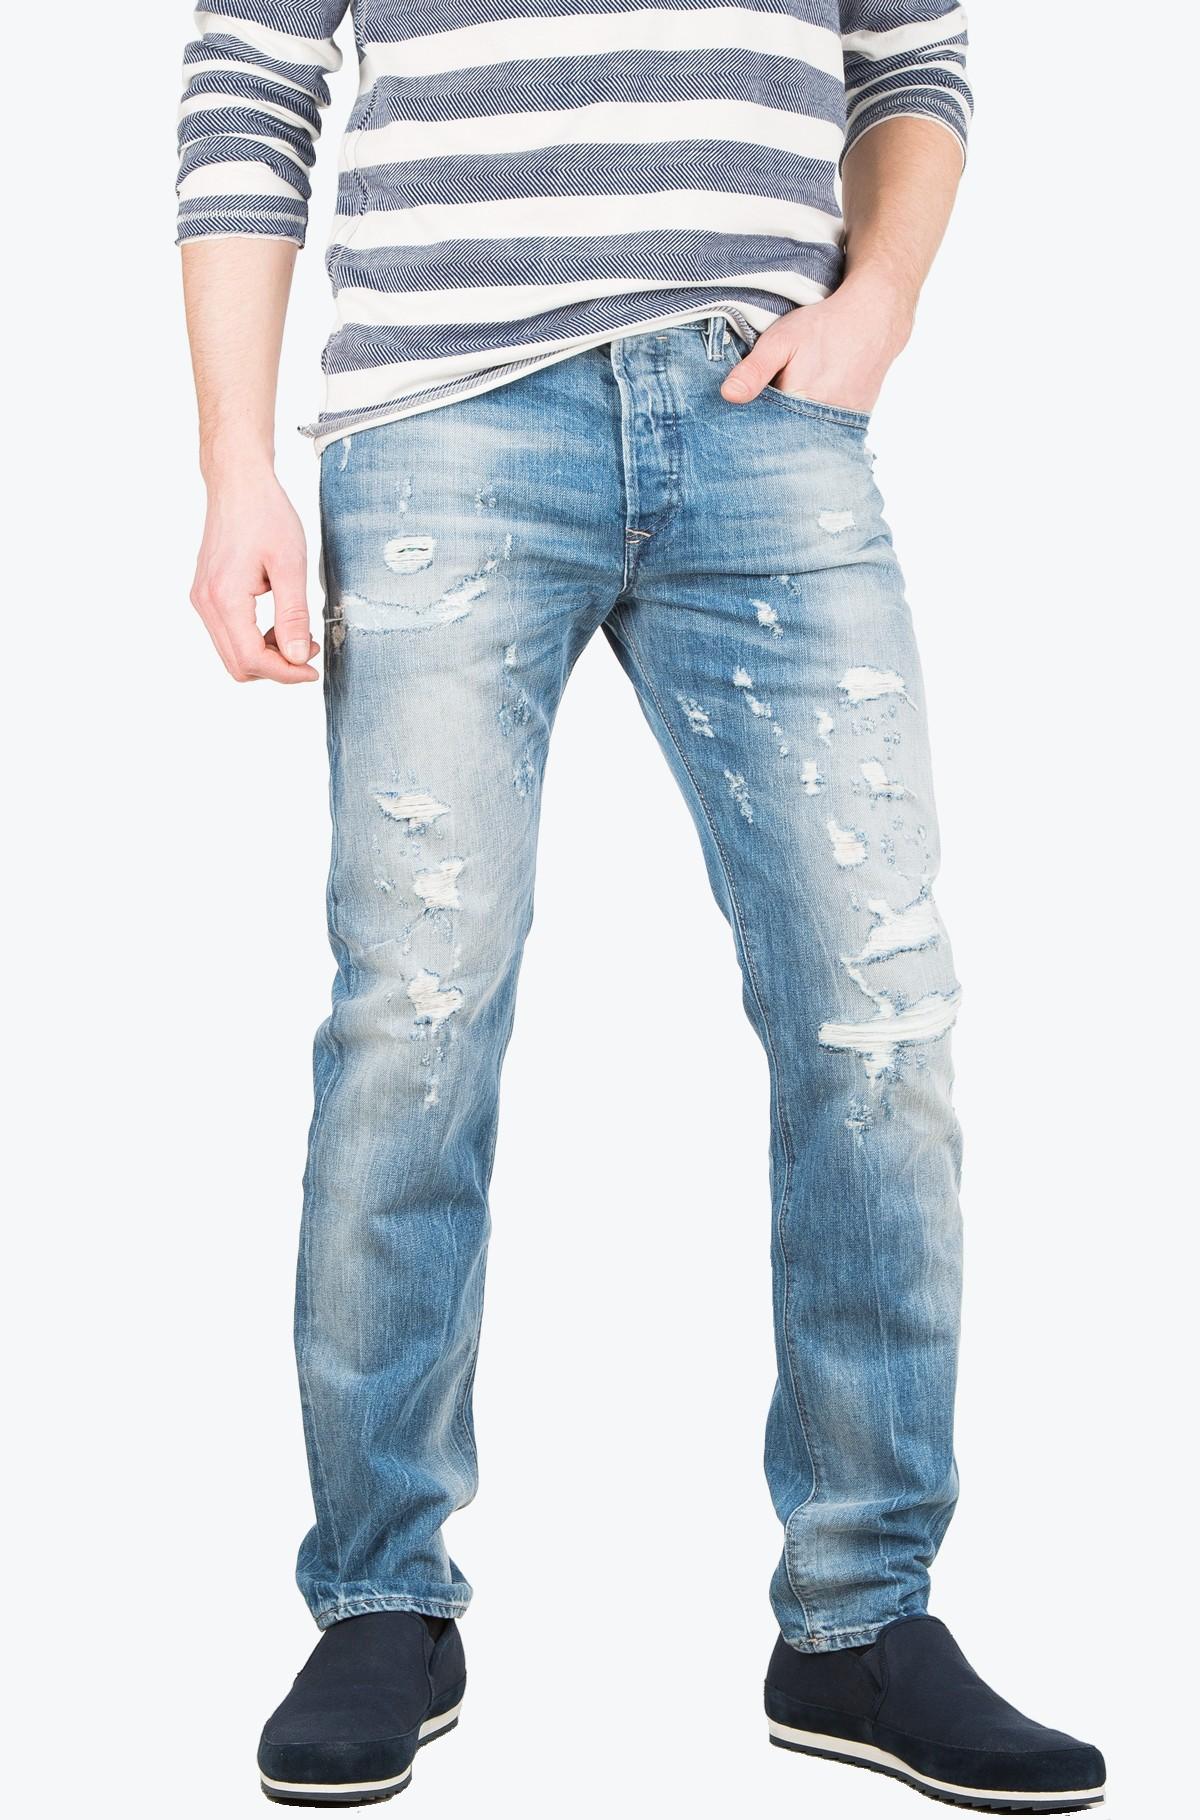 Jeans Buster-full-1